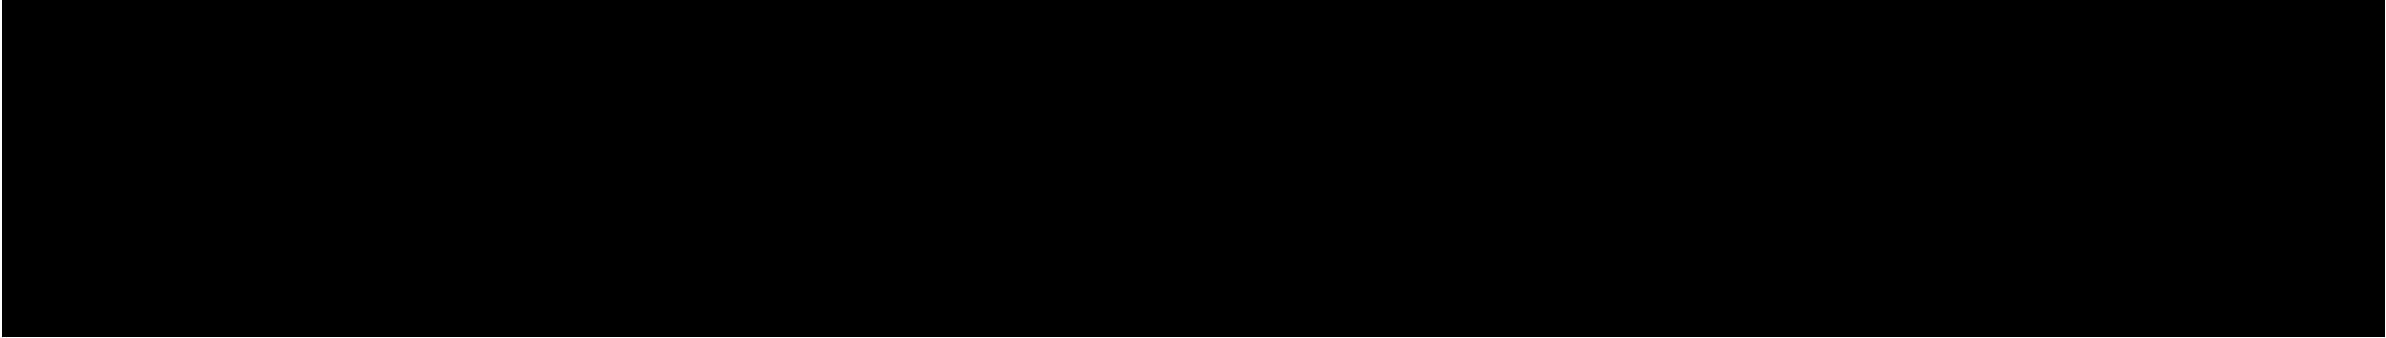 z-style_velikostni-tabulky_cz_2386x338px_myron-jacket_p70006